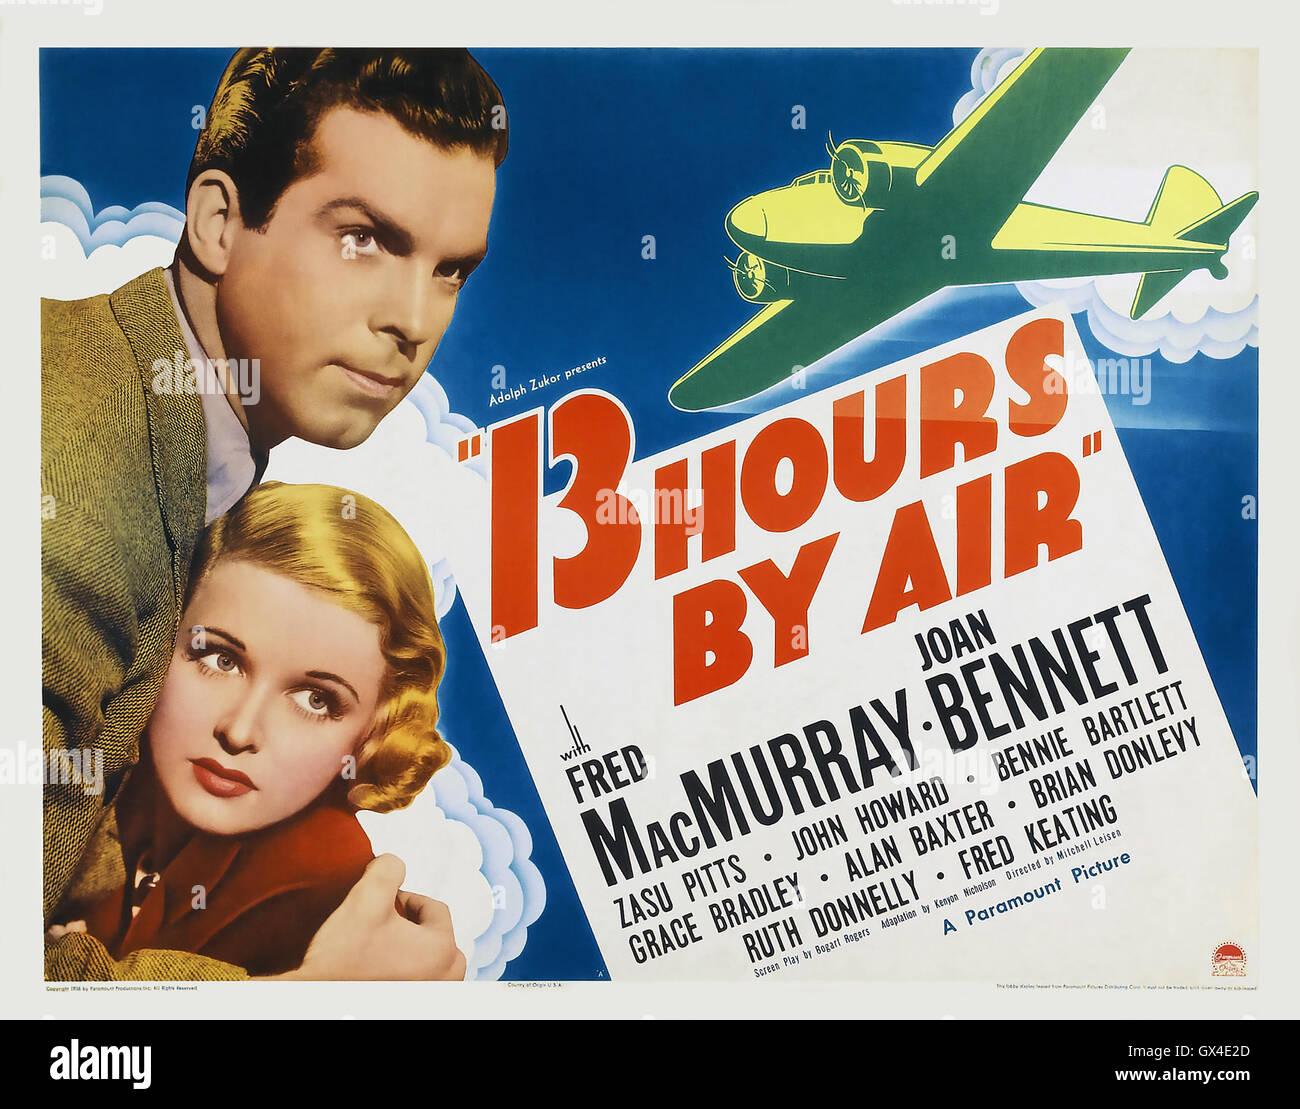 13 HORAS POR AIRE 1936 Paramount Pictures Film con Joan Bennett y Fred MacMurray Imagen De Stock